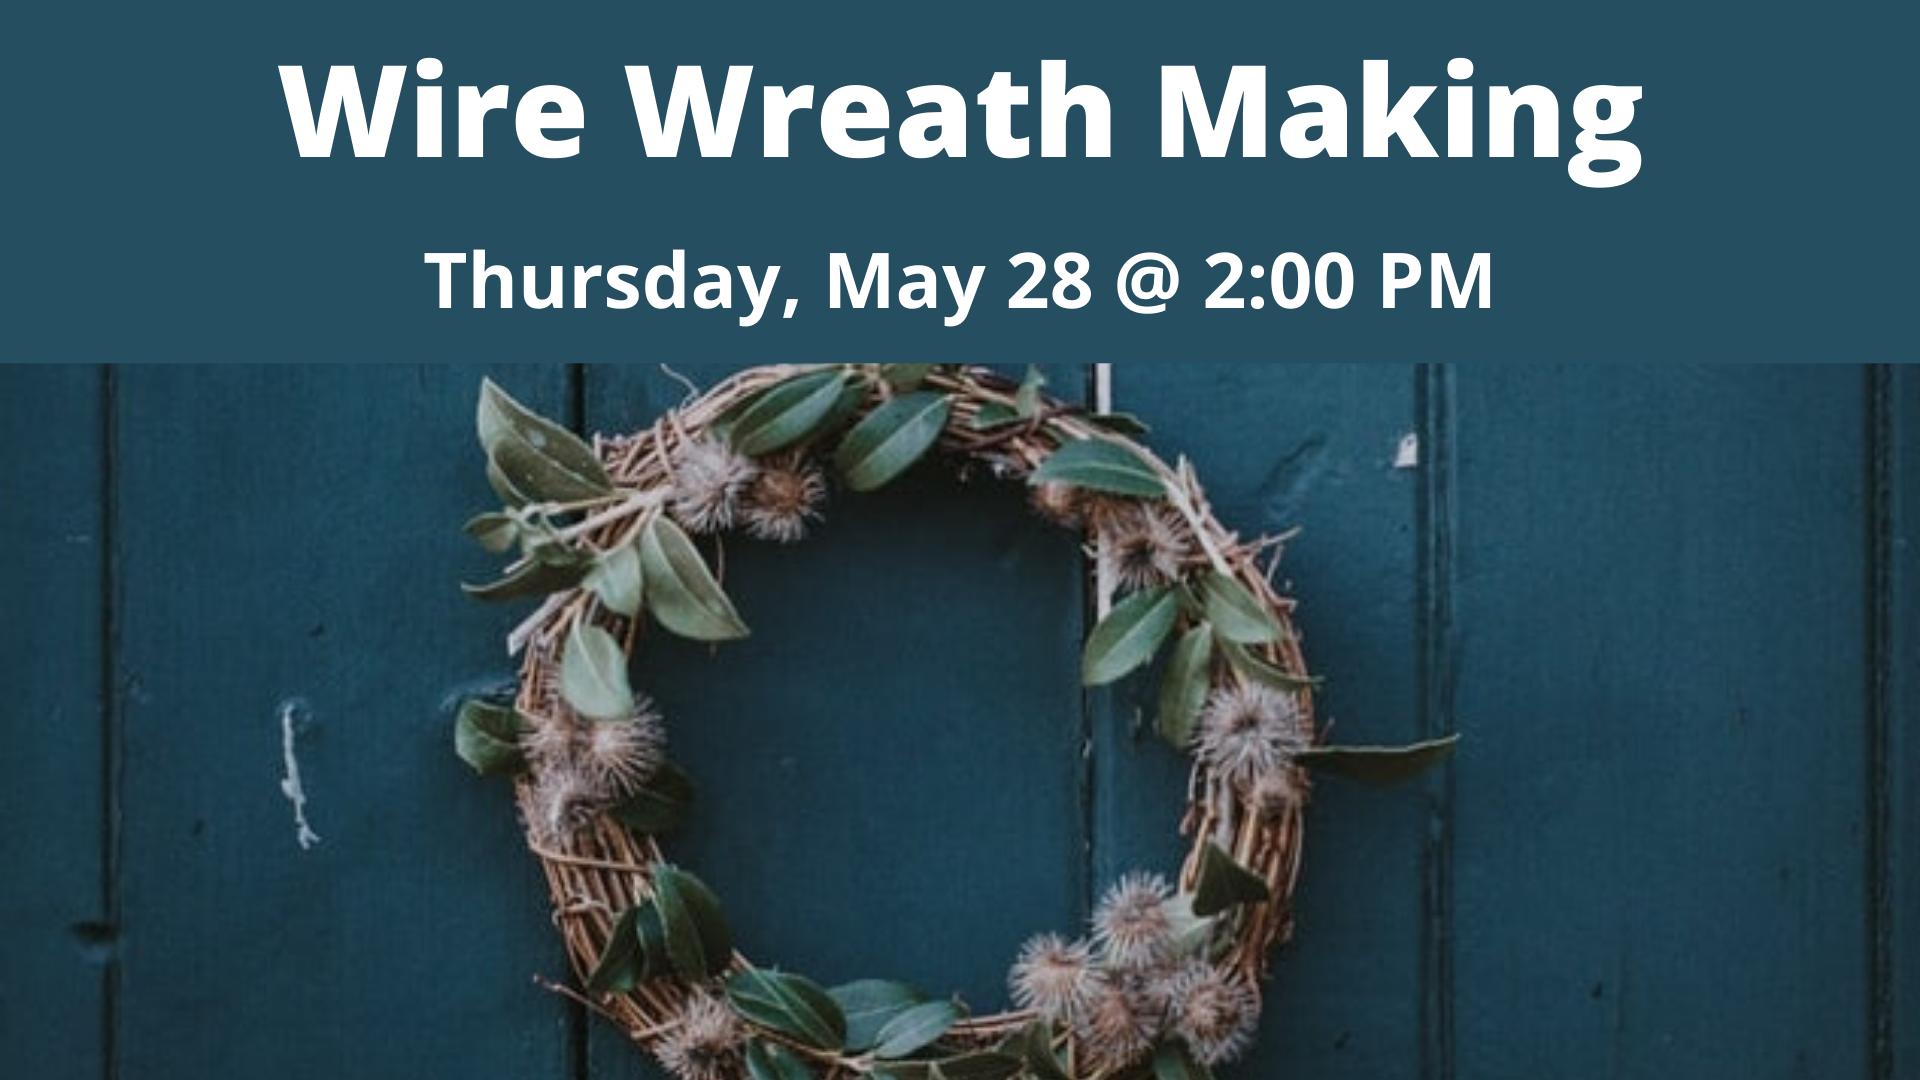 Wire Wreath Making